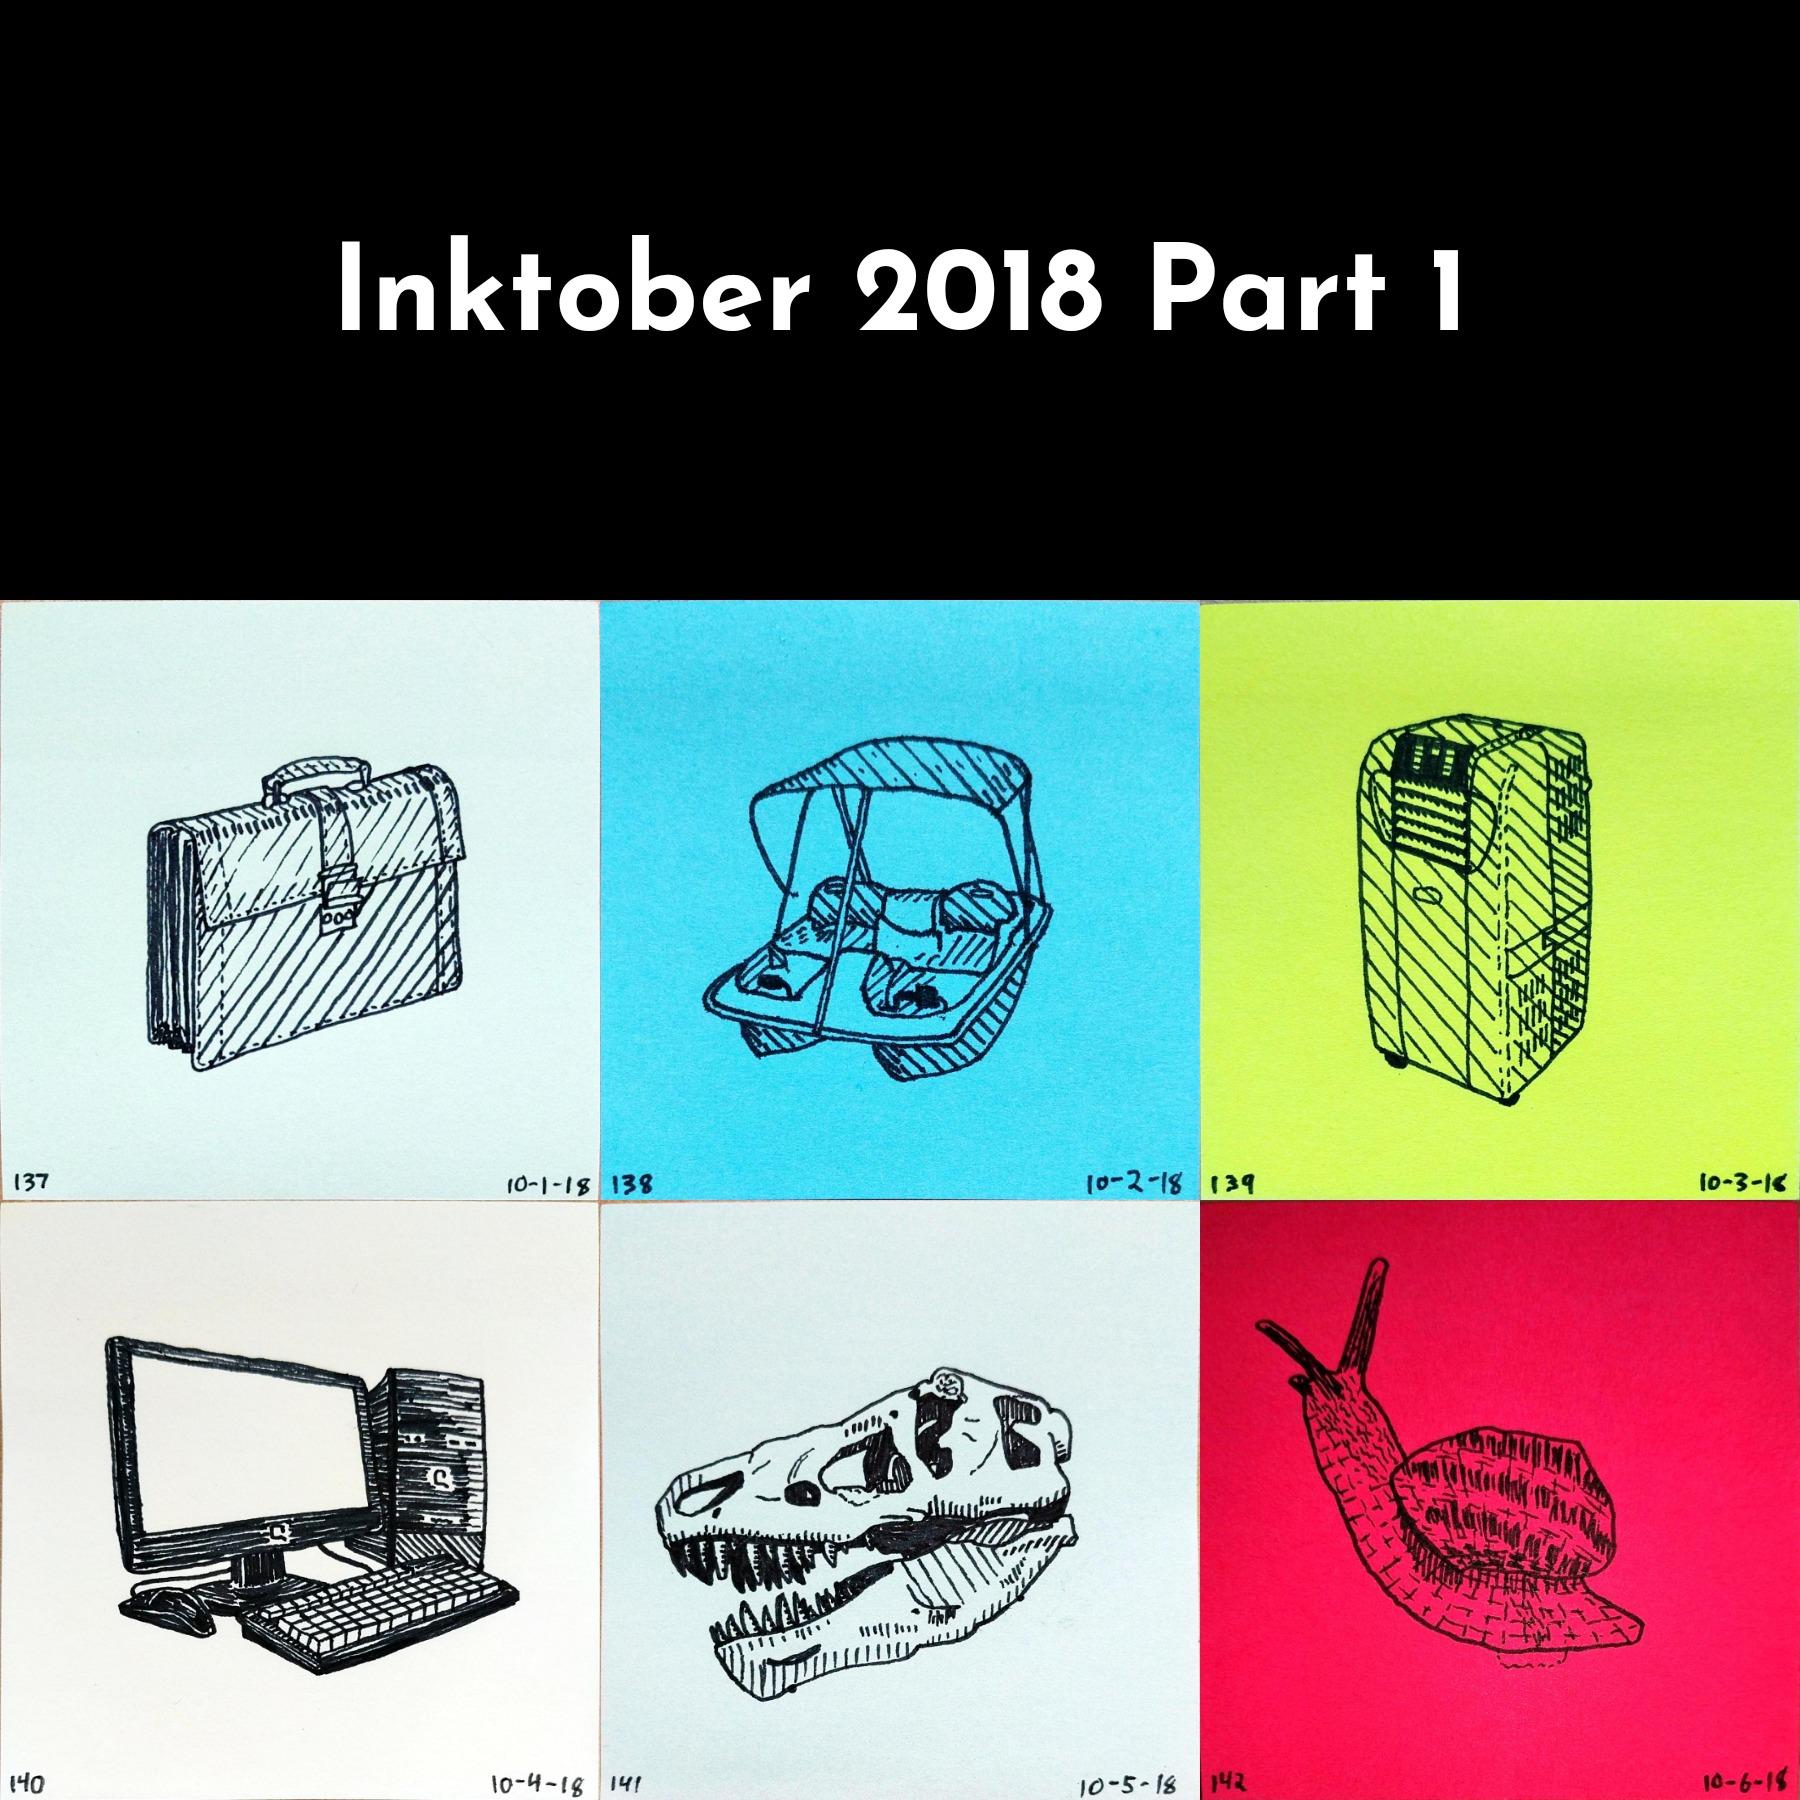 Inktober 2018 Part 1